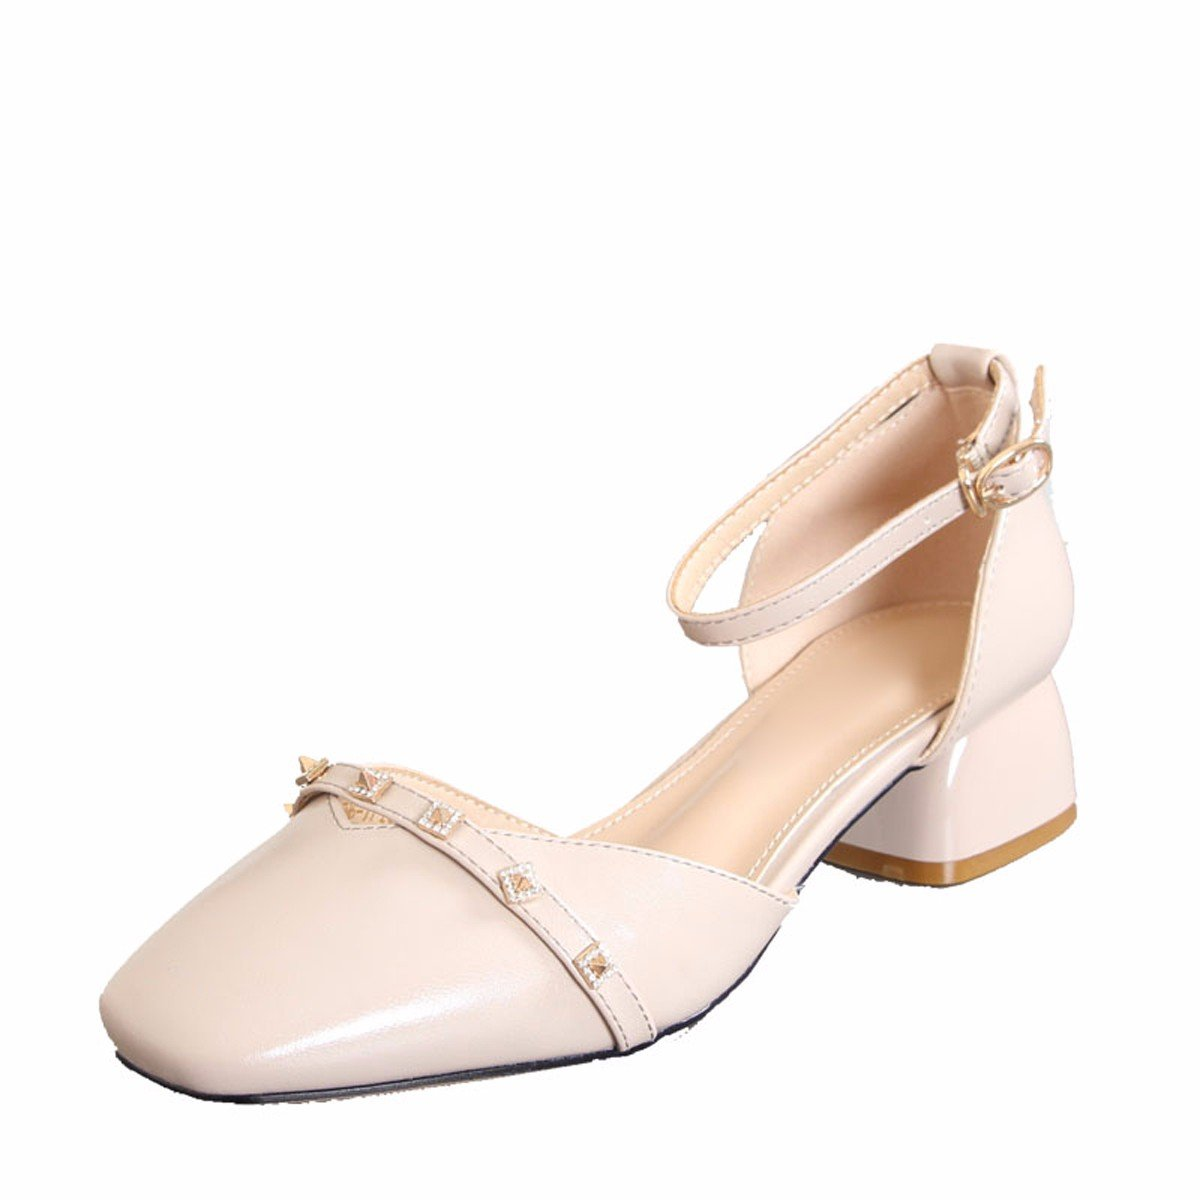 Soft Enval Stil Turnschuhe Schuhe Englisch Keil Mit Frau Ovw80mNyn